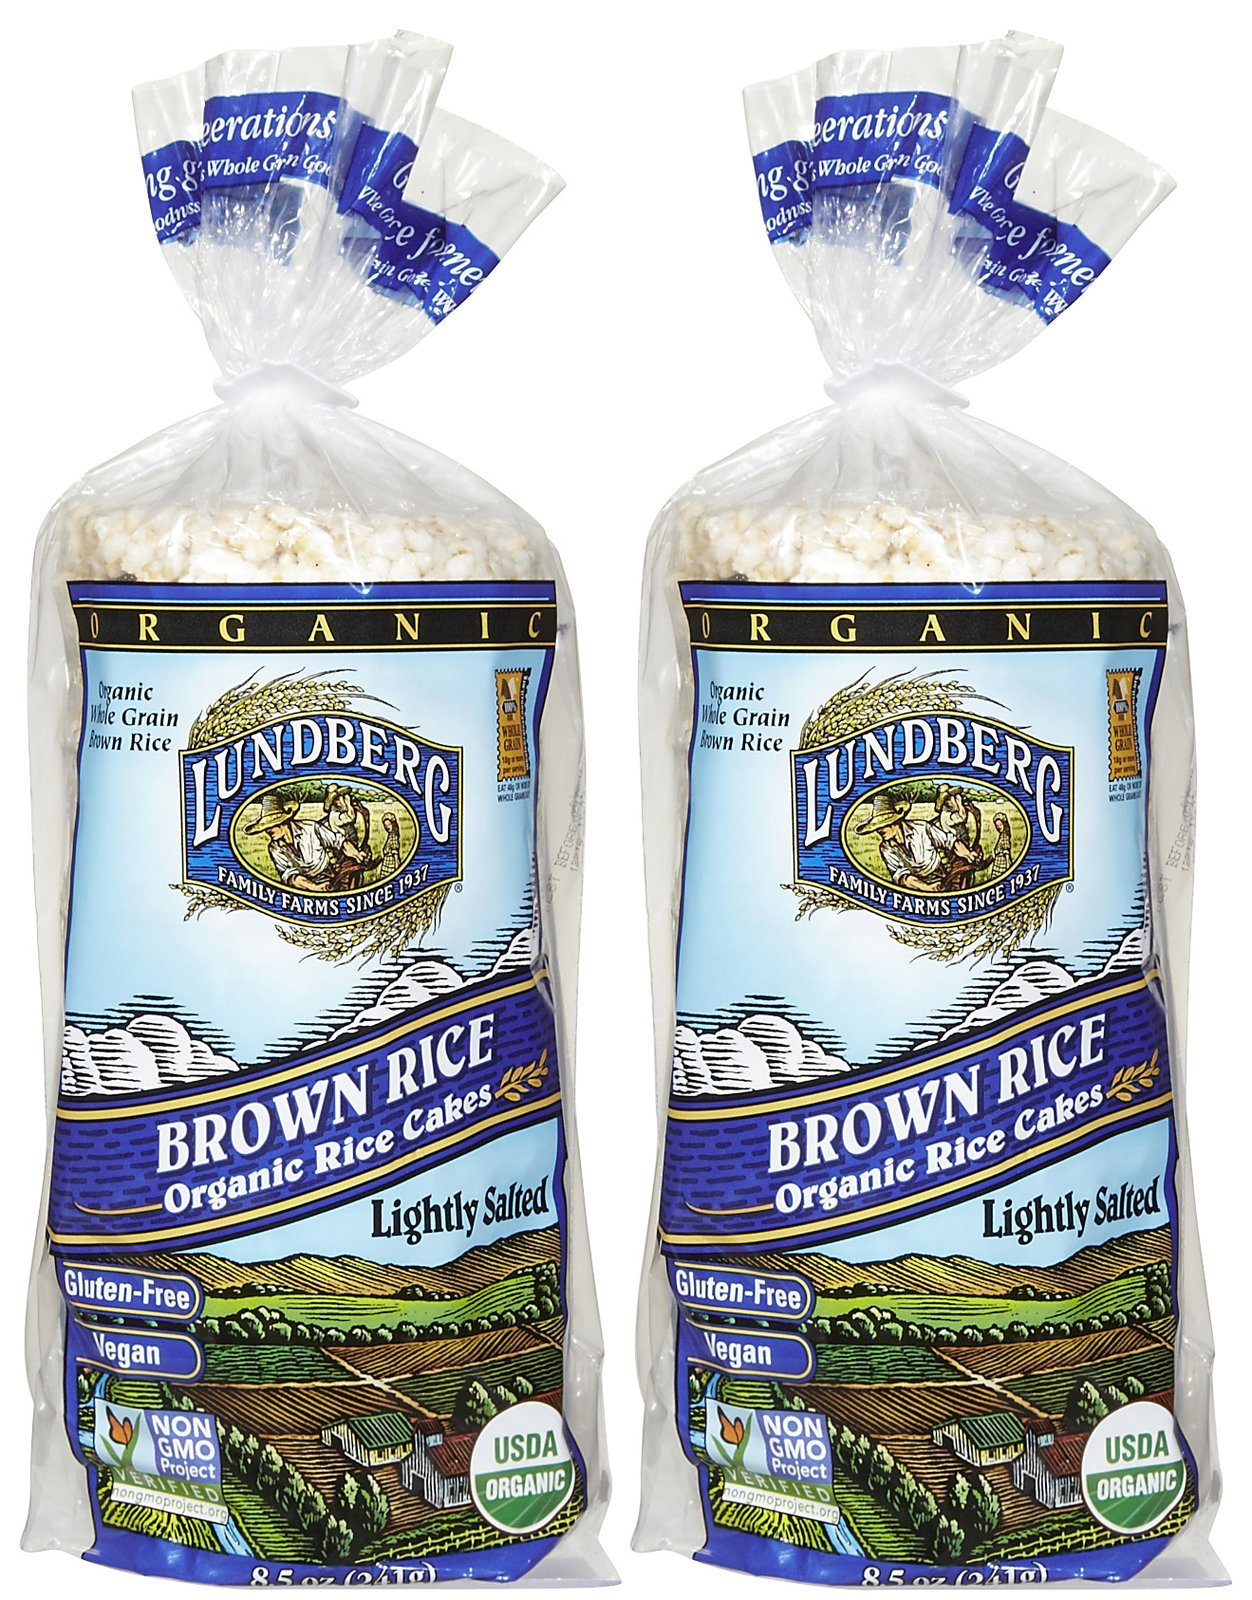 Lundberg Organic Brown Rice Cakes Lightly Salted -- 8.5 oz